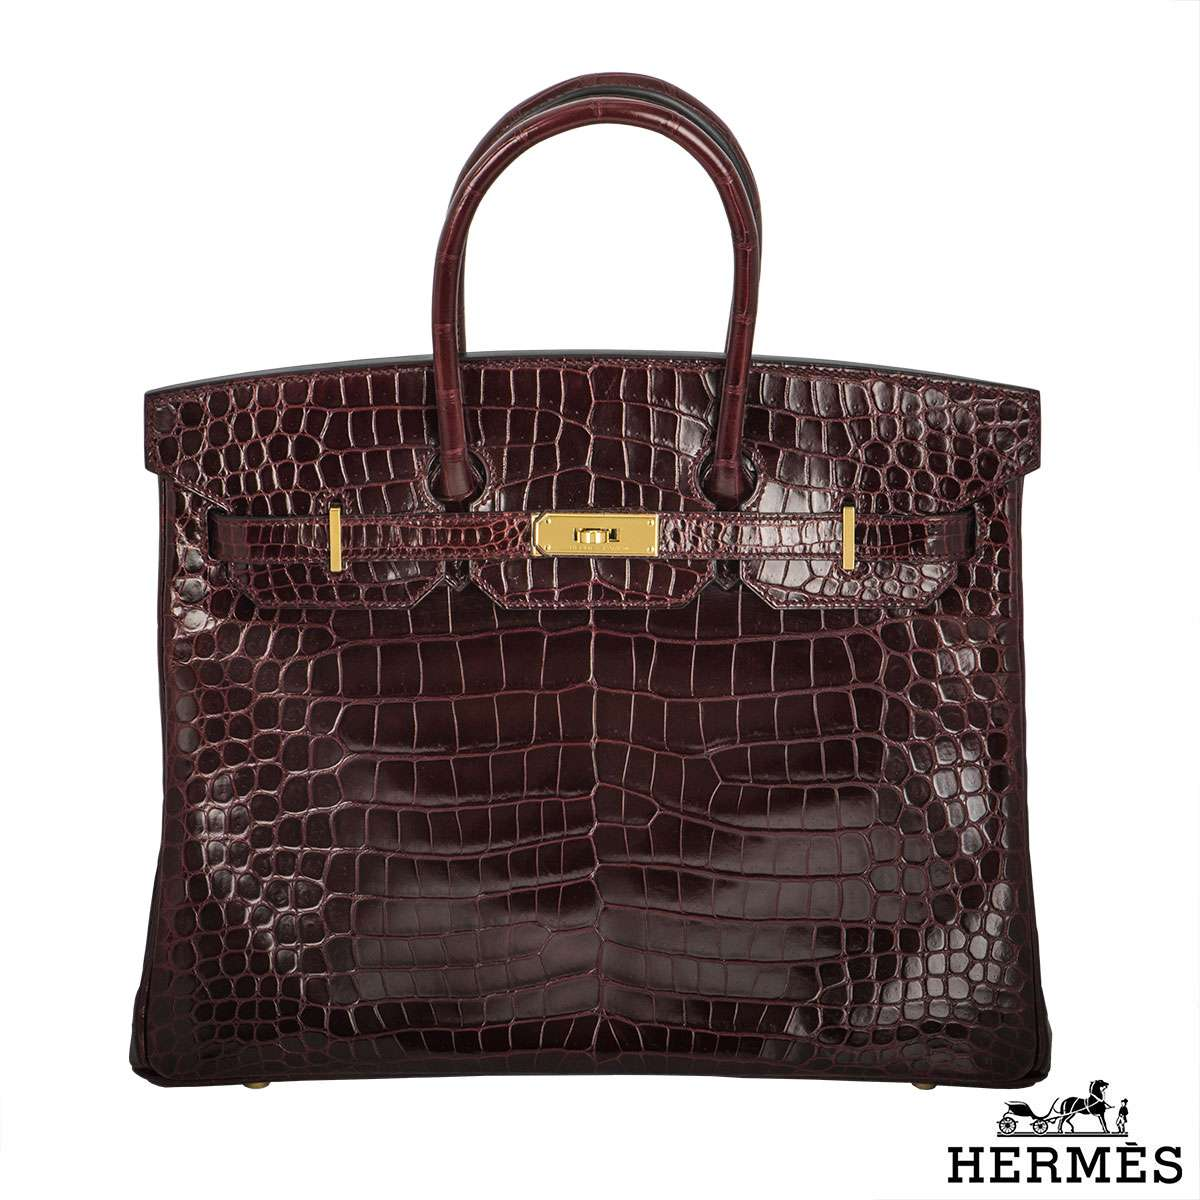 Hermès Porosus Crocodile GHW 35cm Birkin Bag